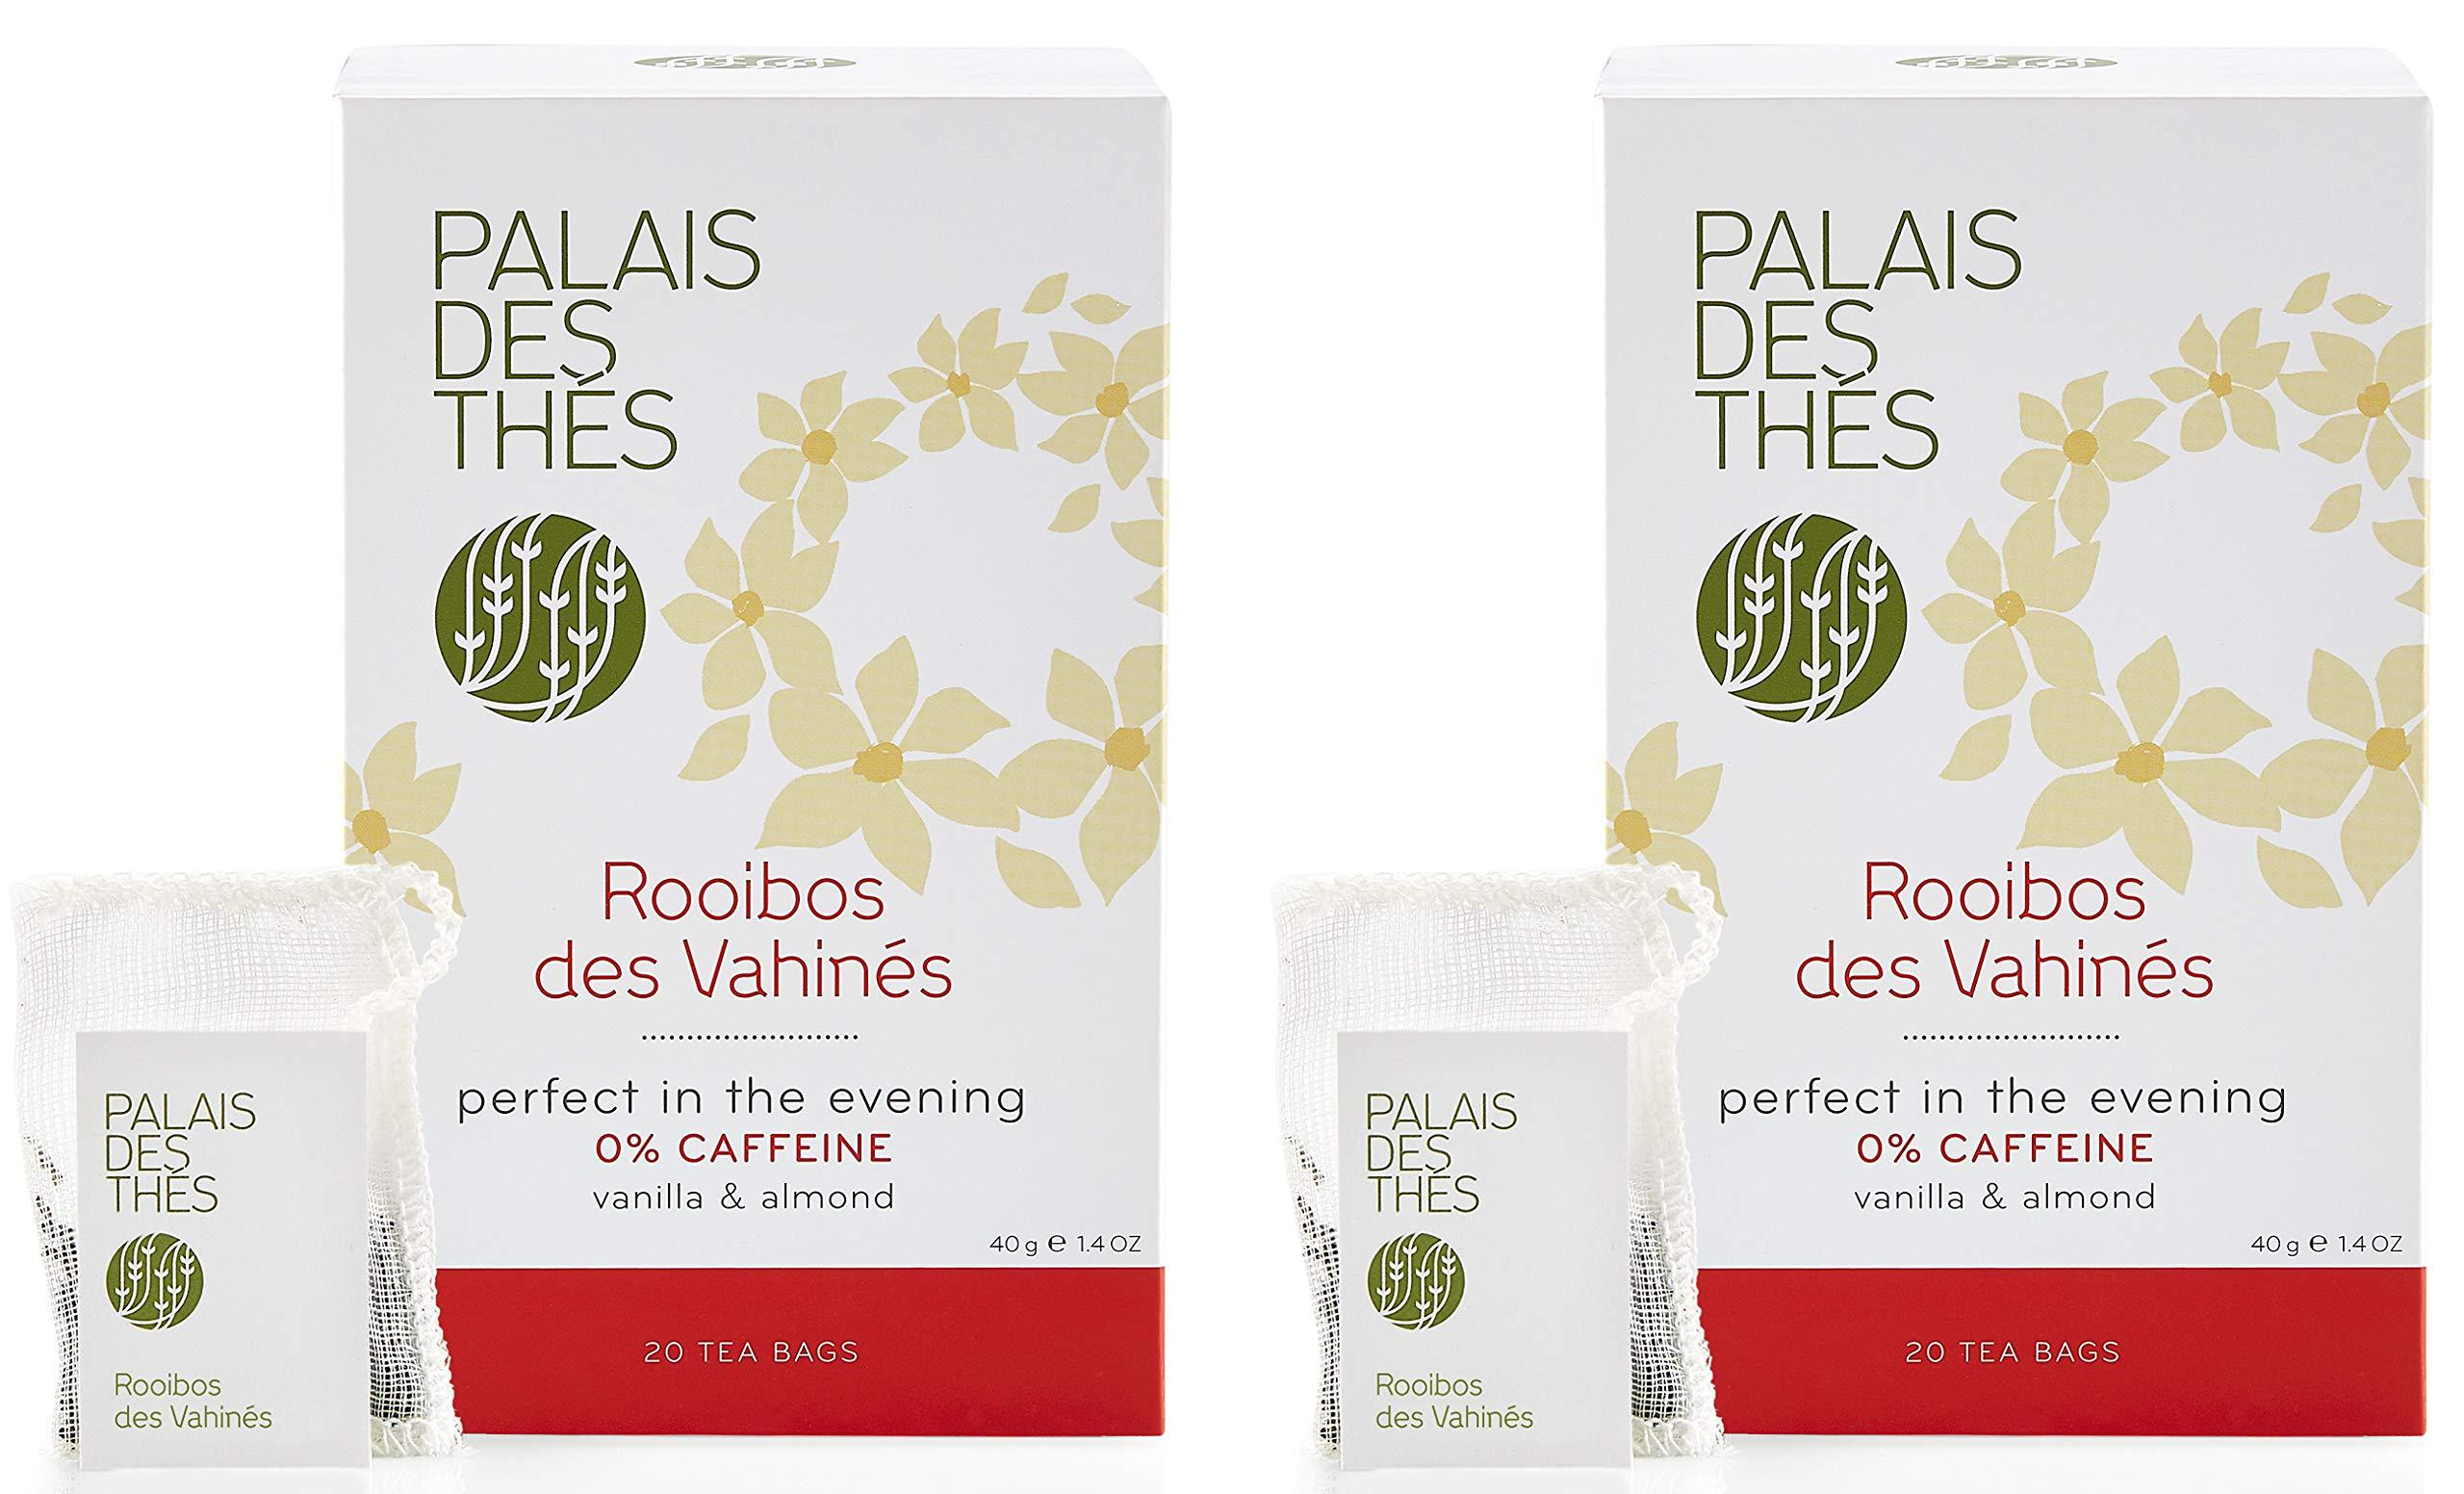 Palais des Thés Rooibos des Vahines Herbal Tea with Vanilla and Almond, 20 Tea Bags (2 Pack)